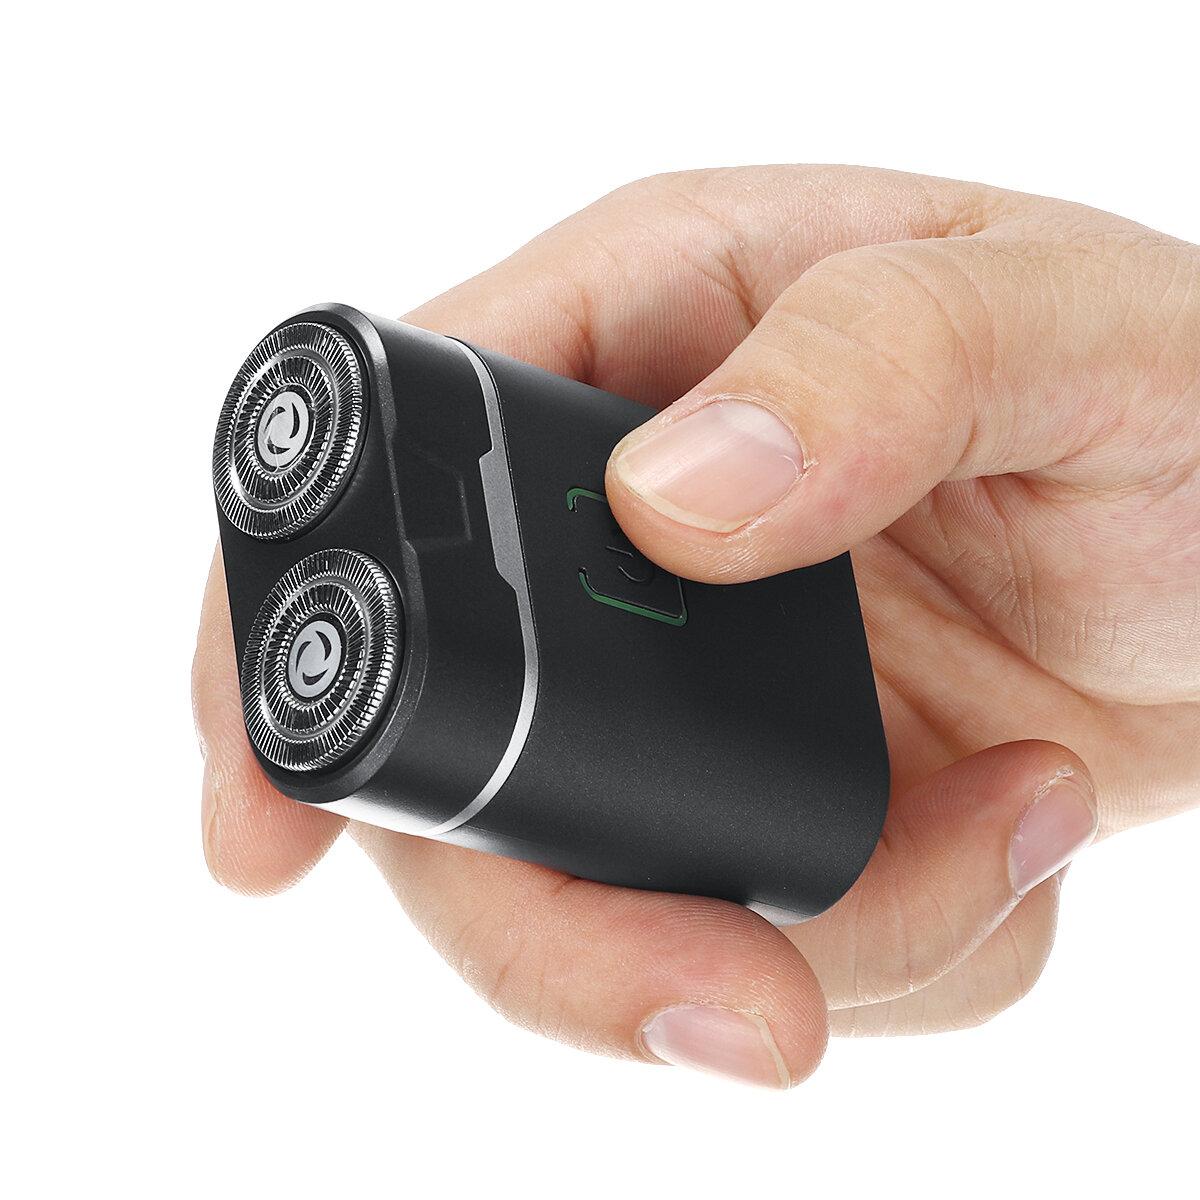 Kemei Mini Waterproof Electric Shaver German Technology Razor Rechargeable Men Hair Shaver